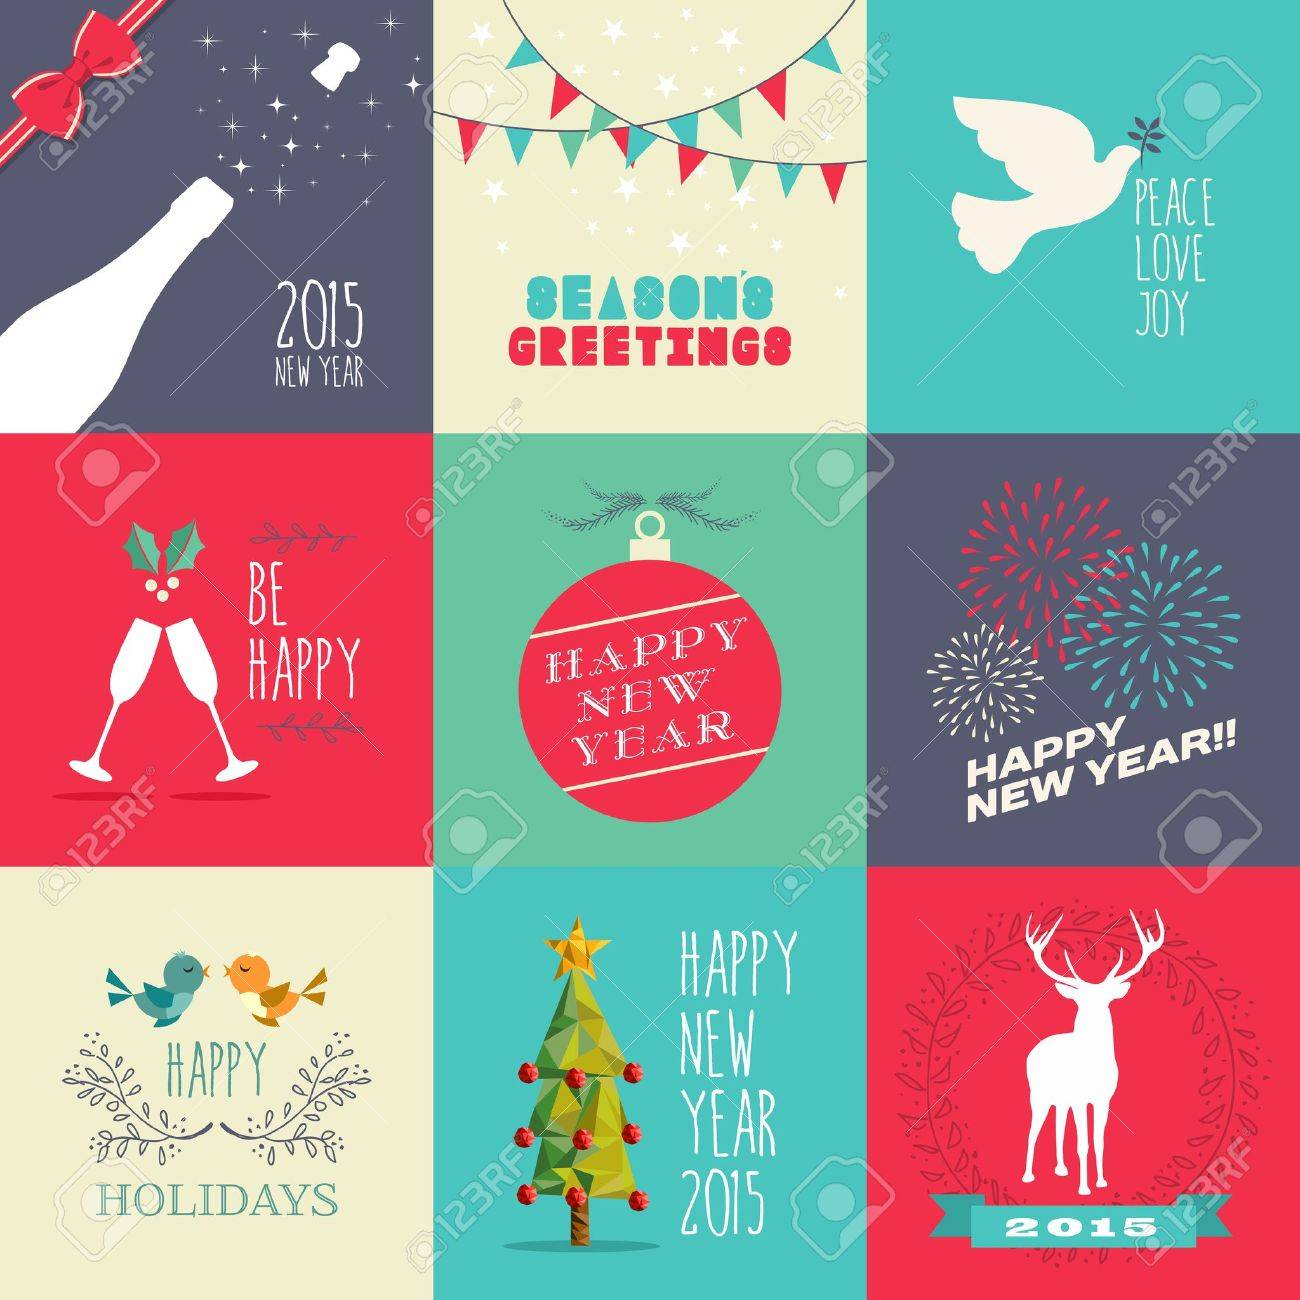 Happy new year 2015 flat design illustration set ideal for website happy new year 2015 flat design illustration set ideal for website greeting card and m4hsunfo